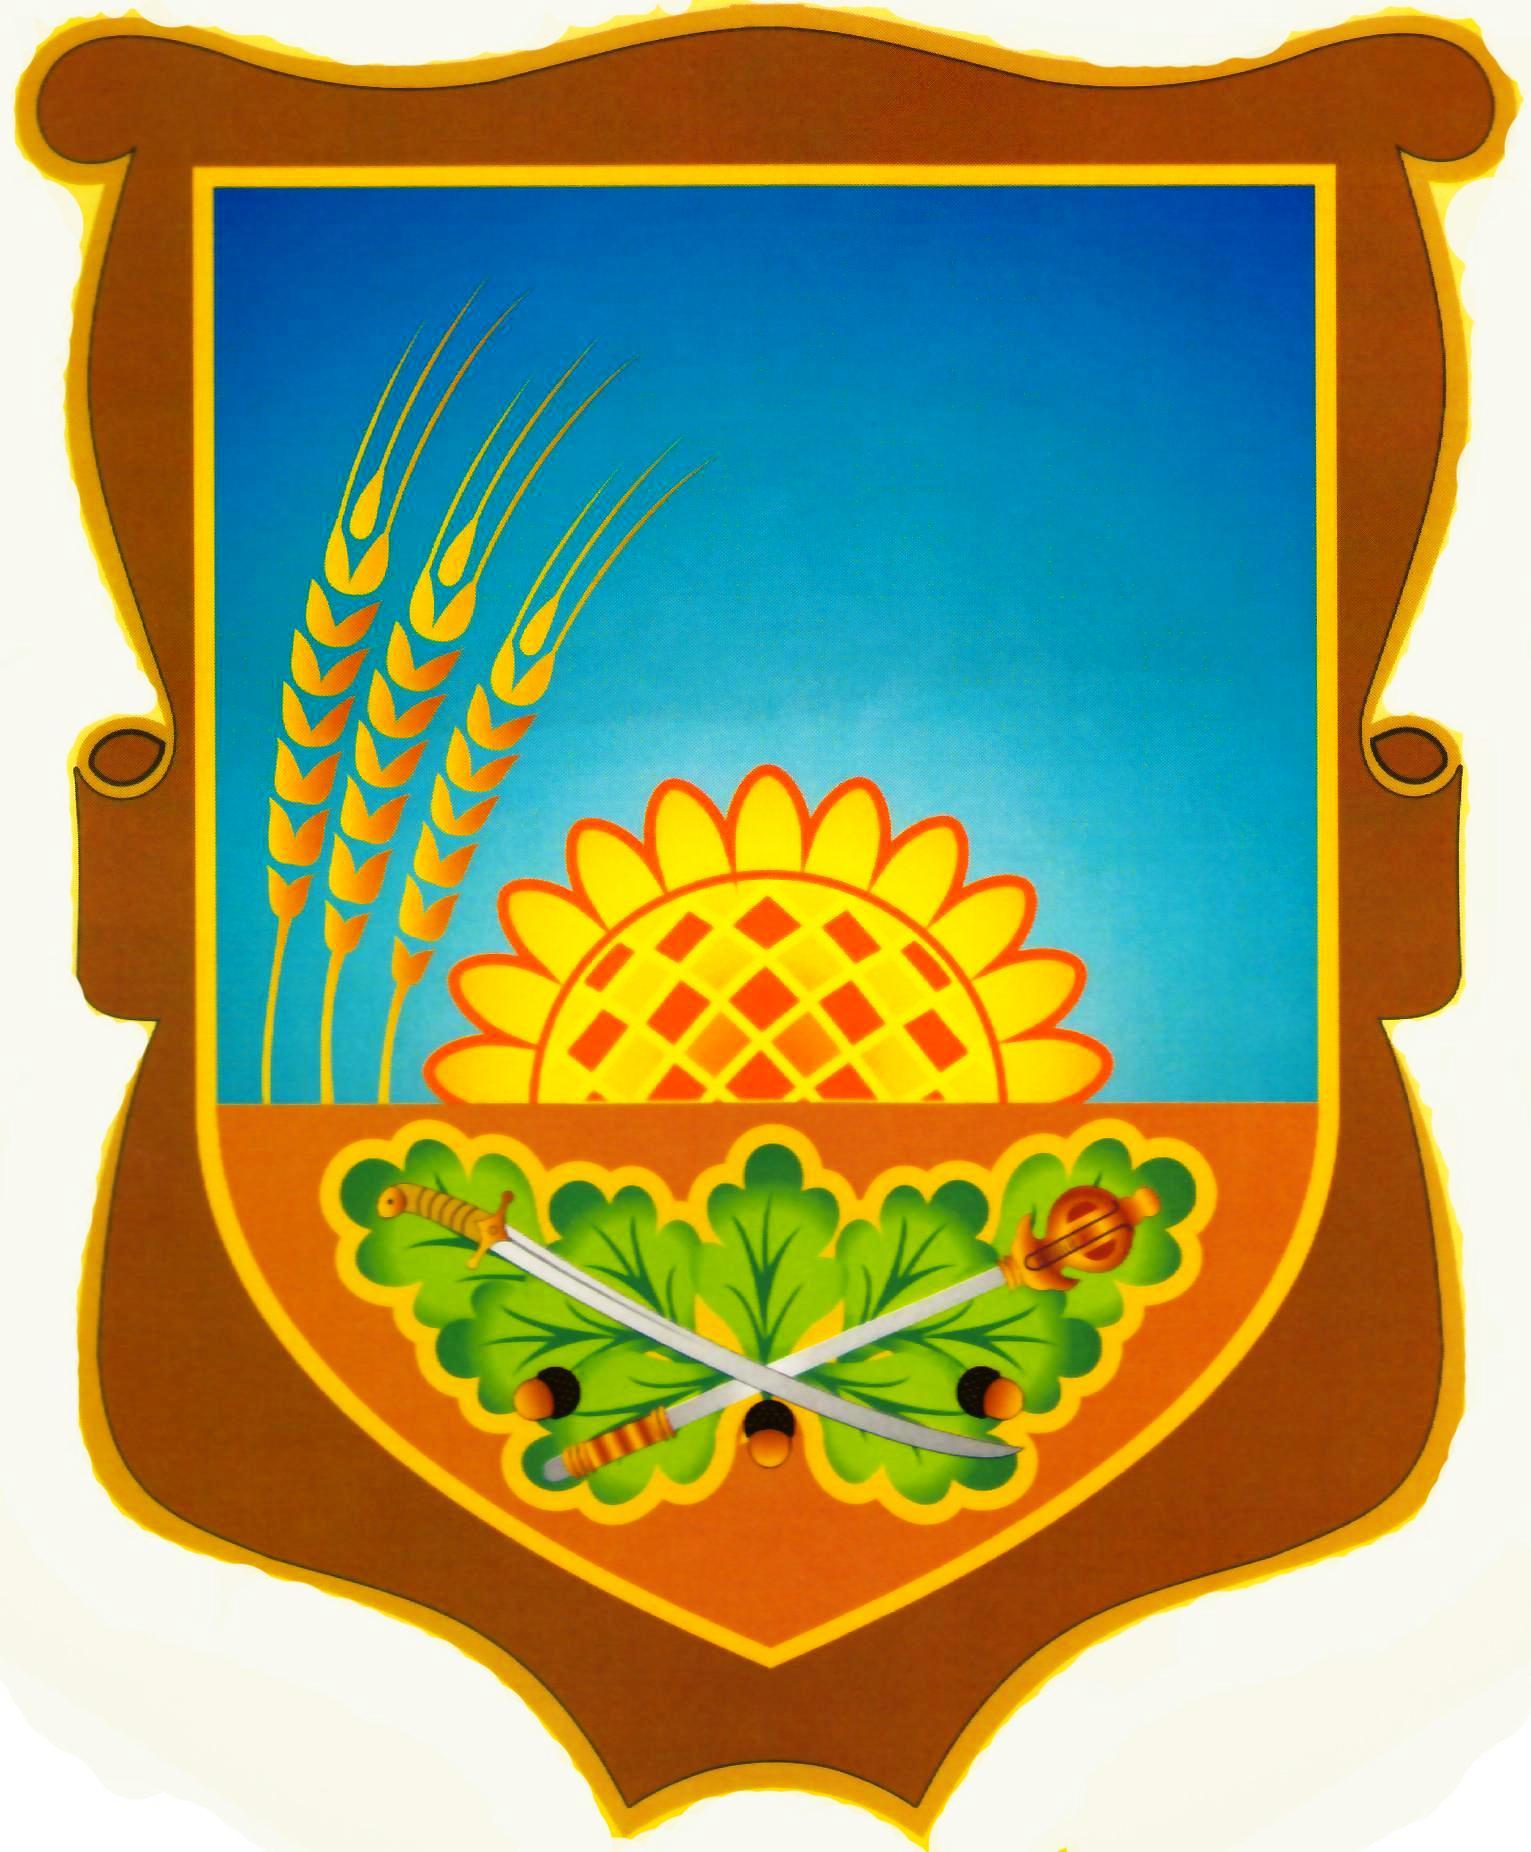 shyrokivska-raionna-rada-dnipropetrovska-oblast